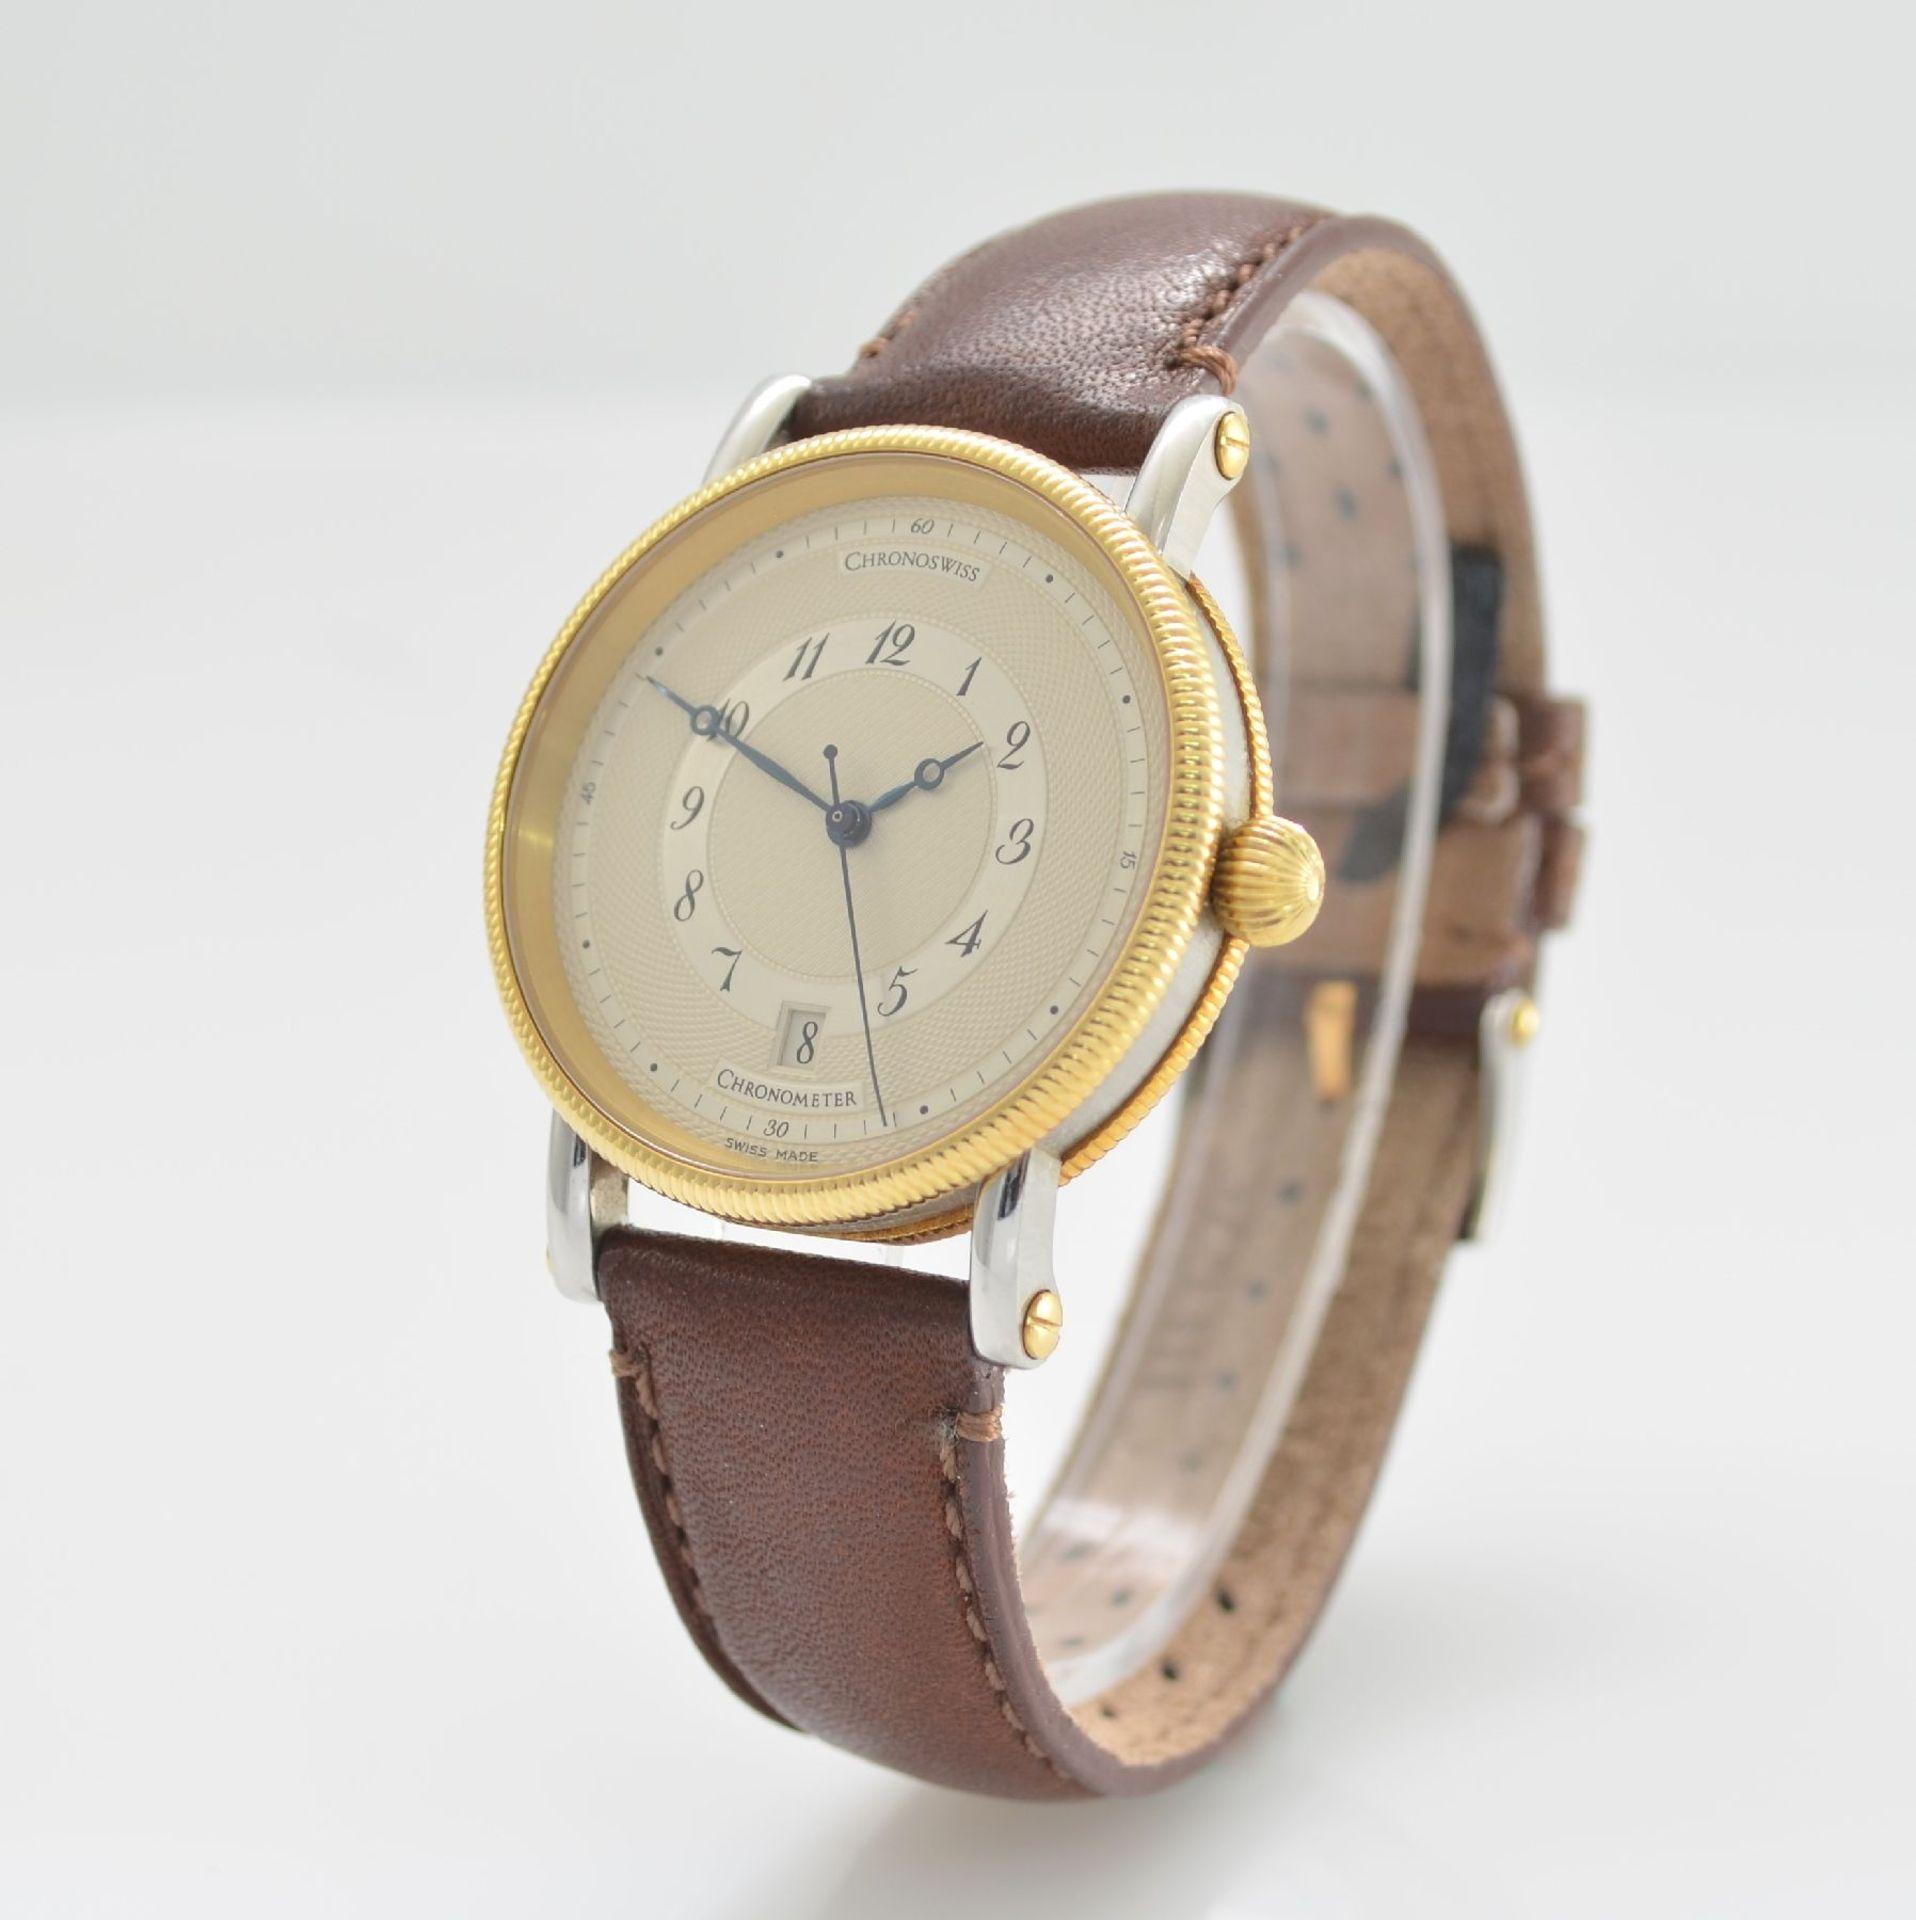 CHRONOSWISS Chronometer Herrenarmbanduhr, Automatik, Ref. CH 2822, Edelstahl/Gold kombiniert inkl. - Bild 3 aus 7